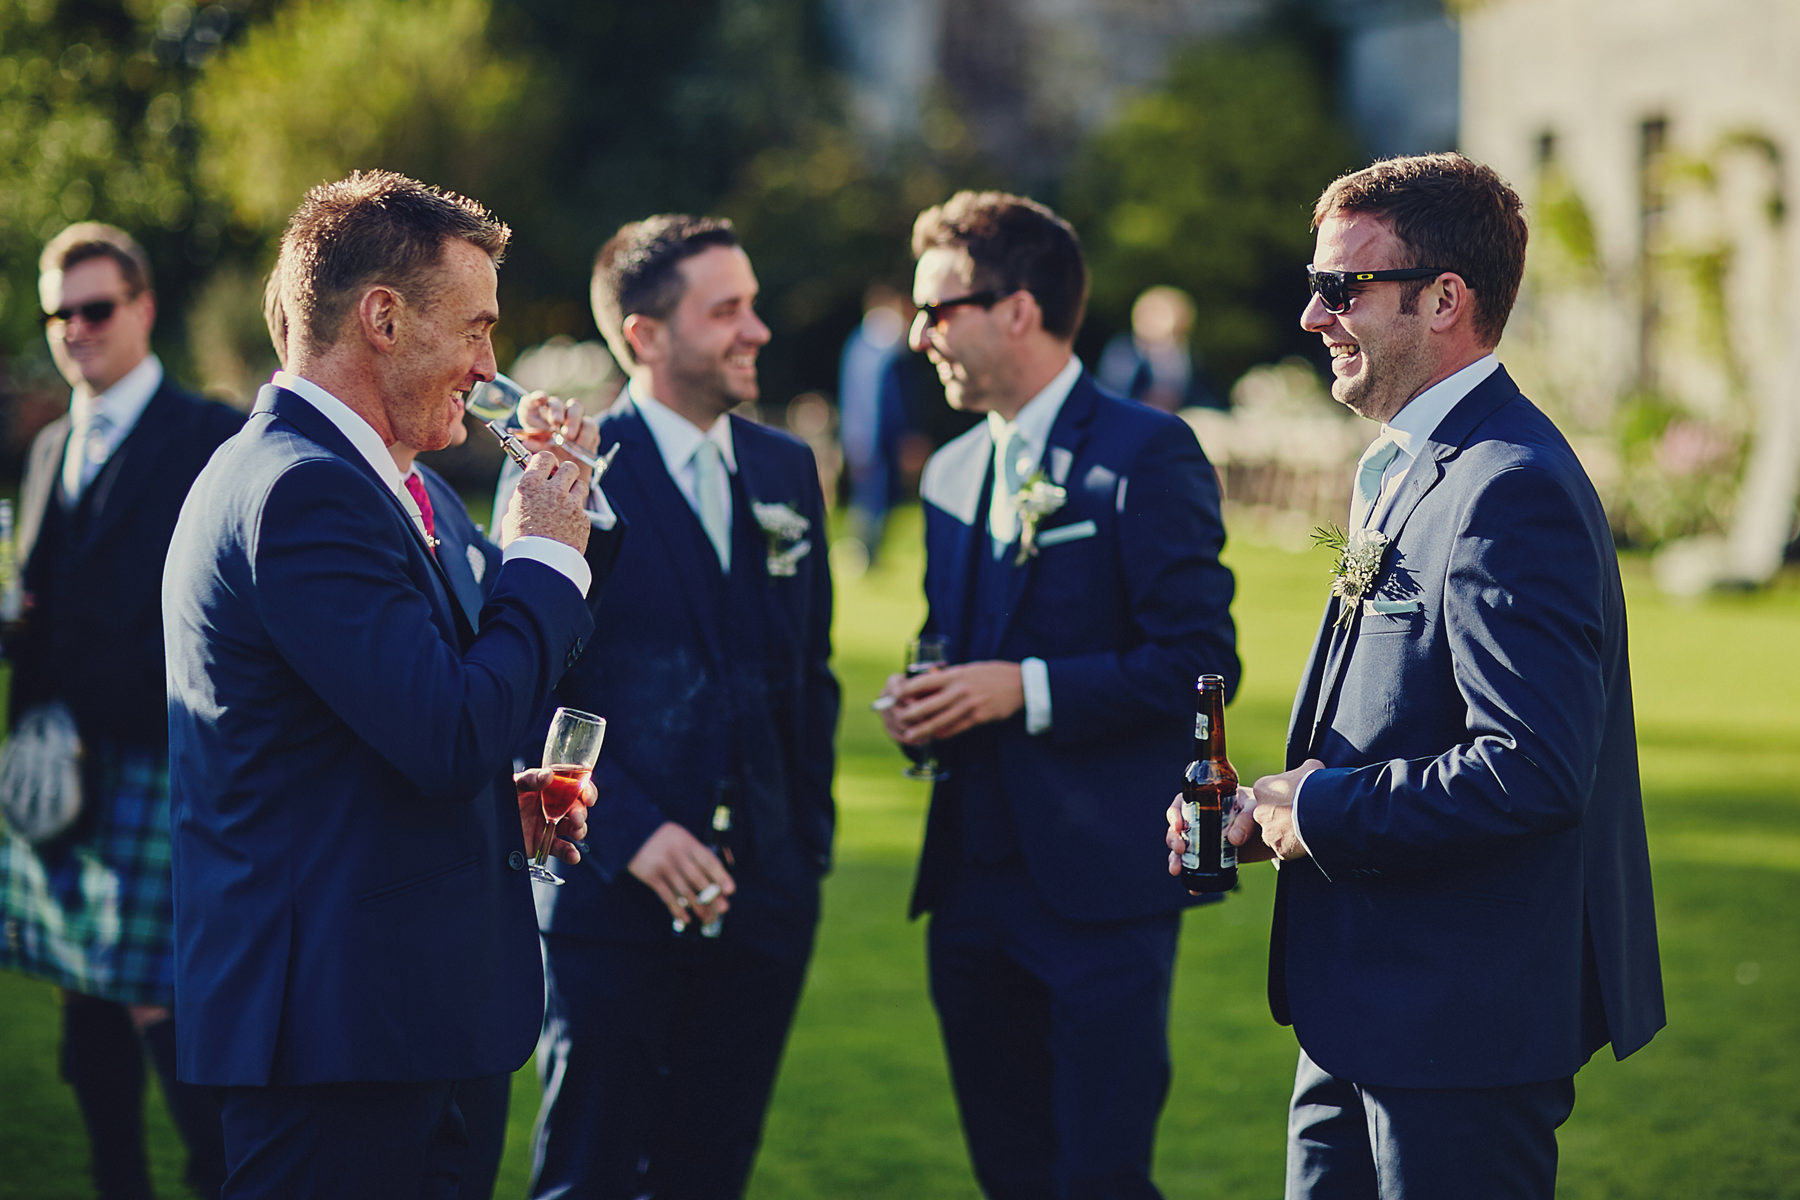 Wedding at Borris House co.Carlow 062 - Borris House wedding | Cara & David